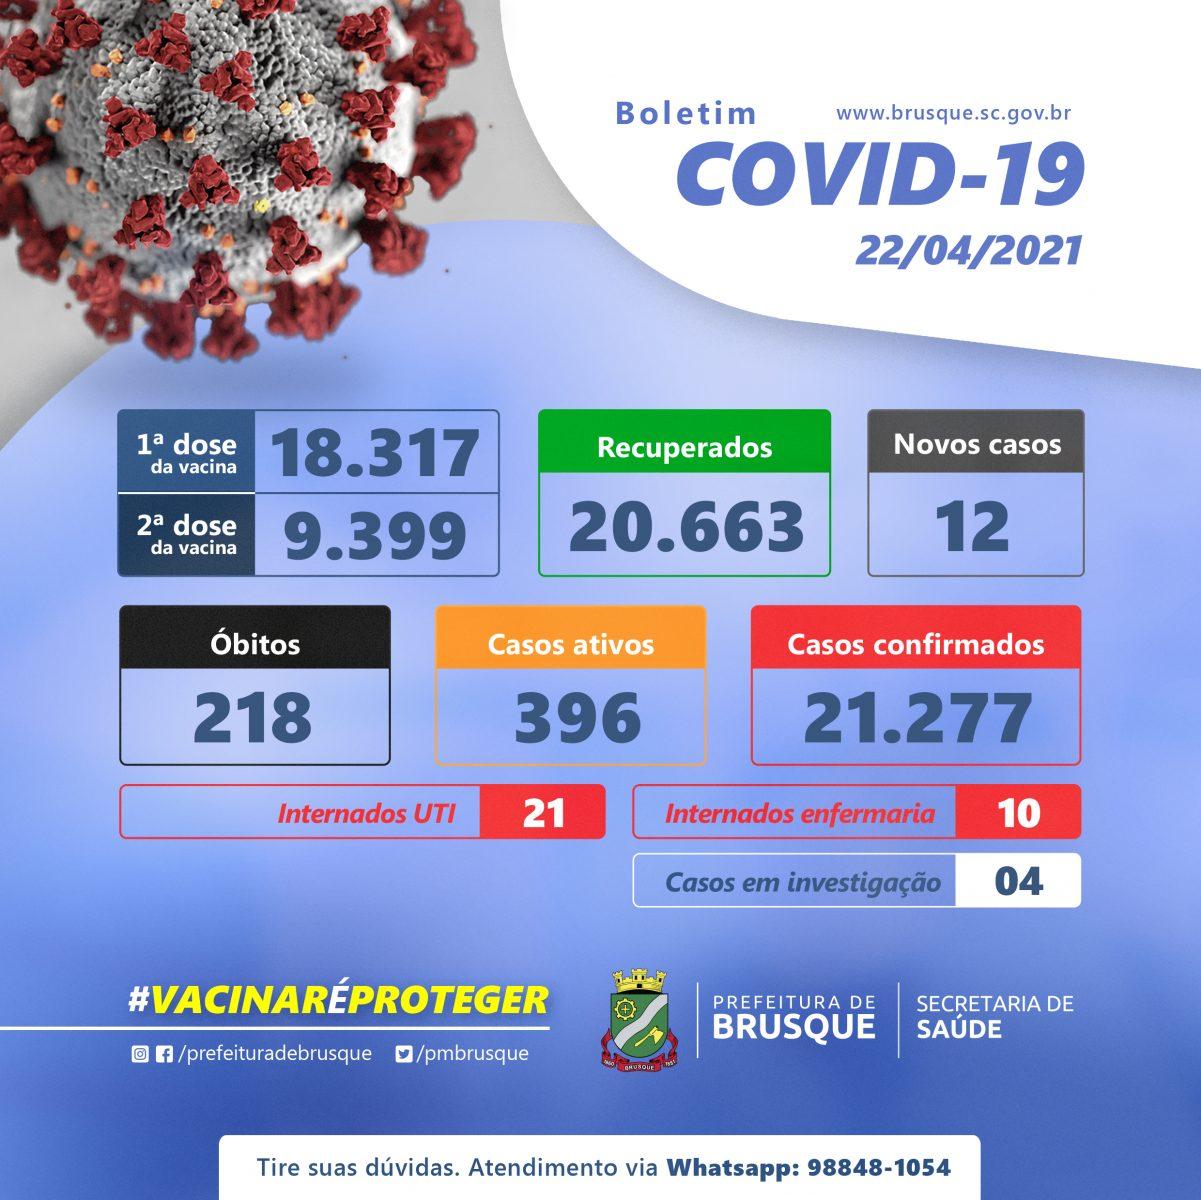 Covid 19: Confira o boletim epidemiológico desta quinta-feira (22)